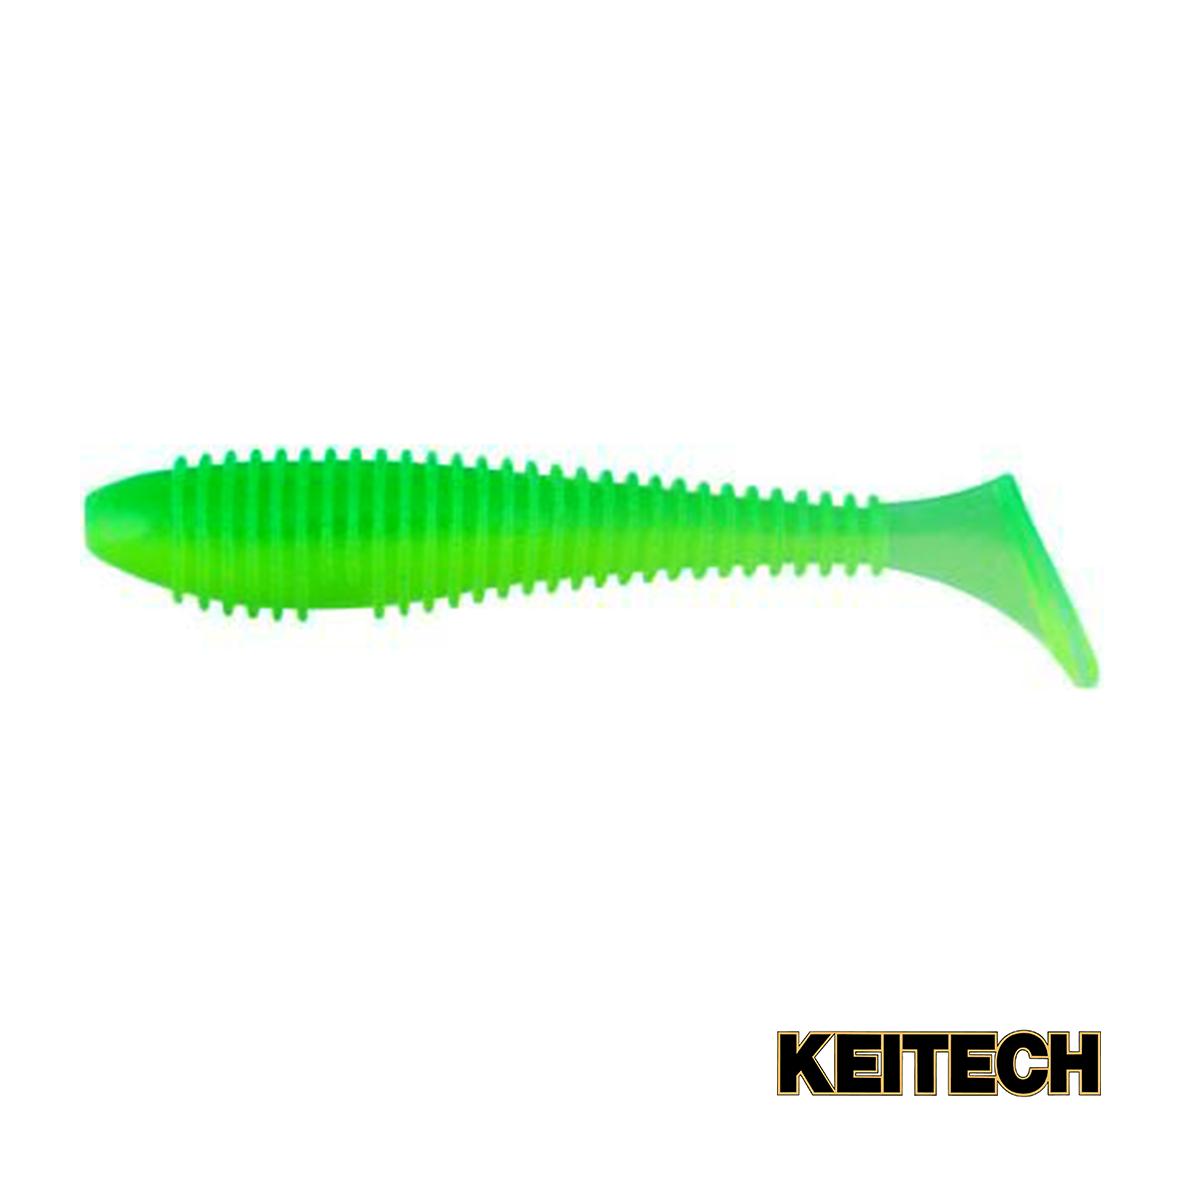 "Силикон Keitech Swing Impact FAT 4.3"" (5 шт/упак) ц:ea#11 lime ch"